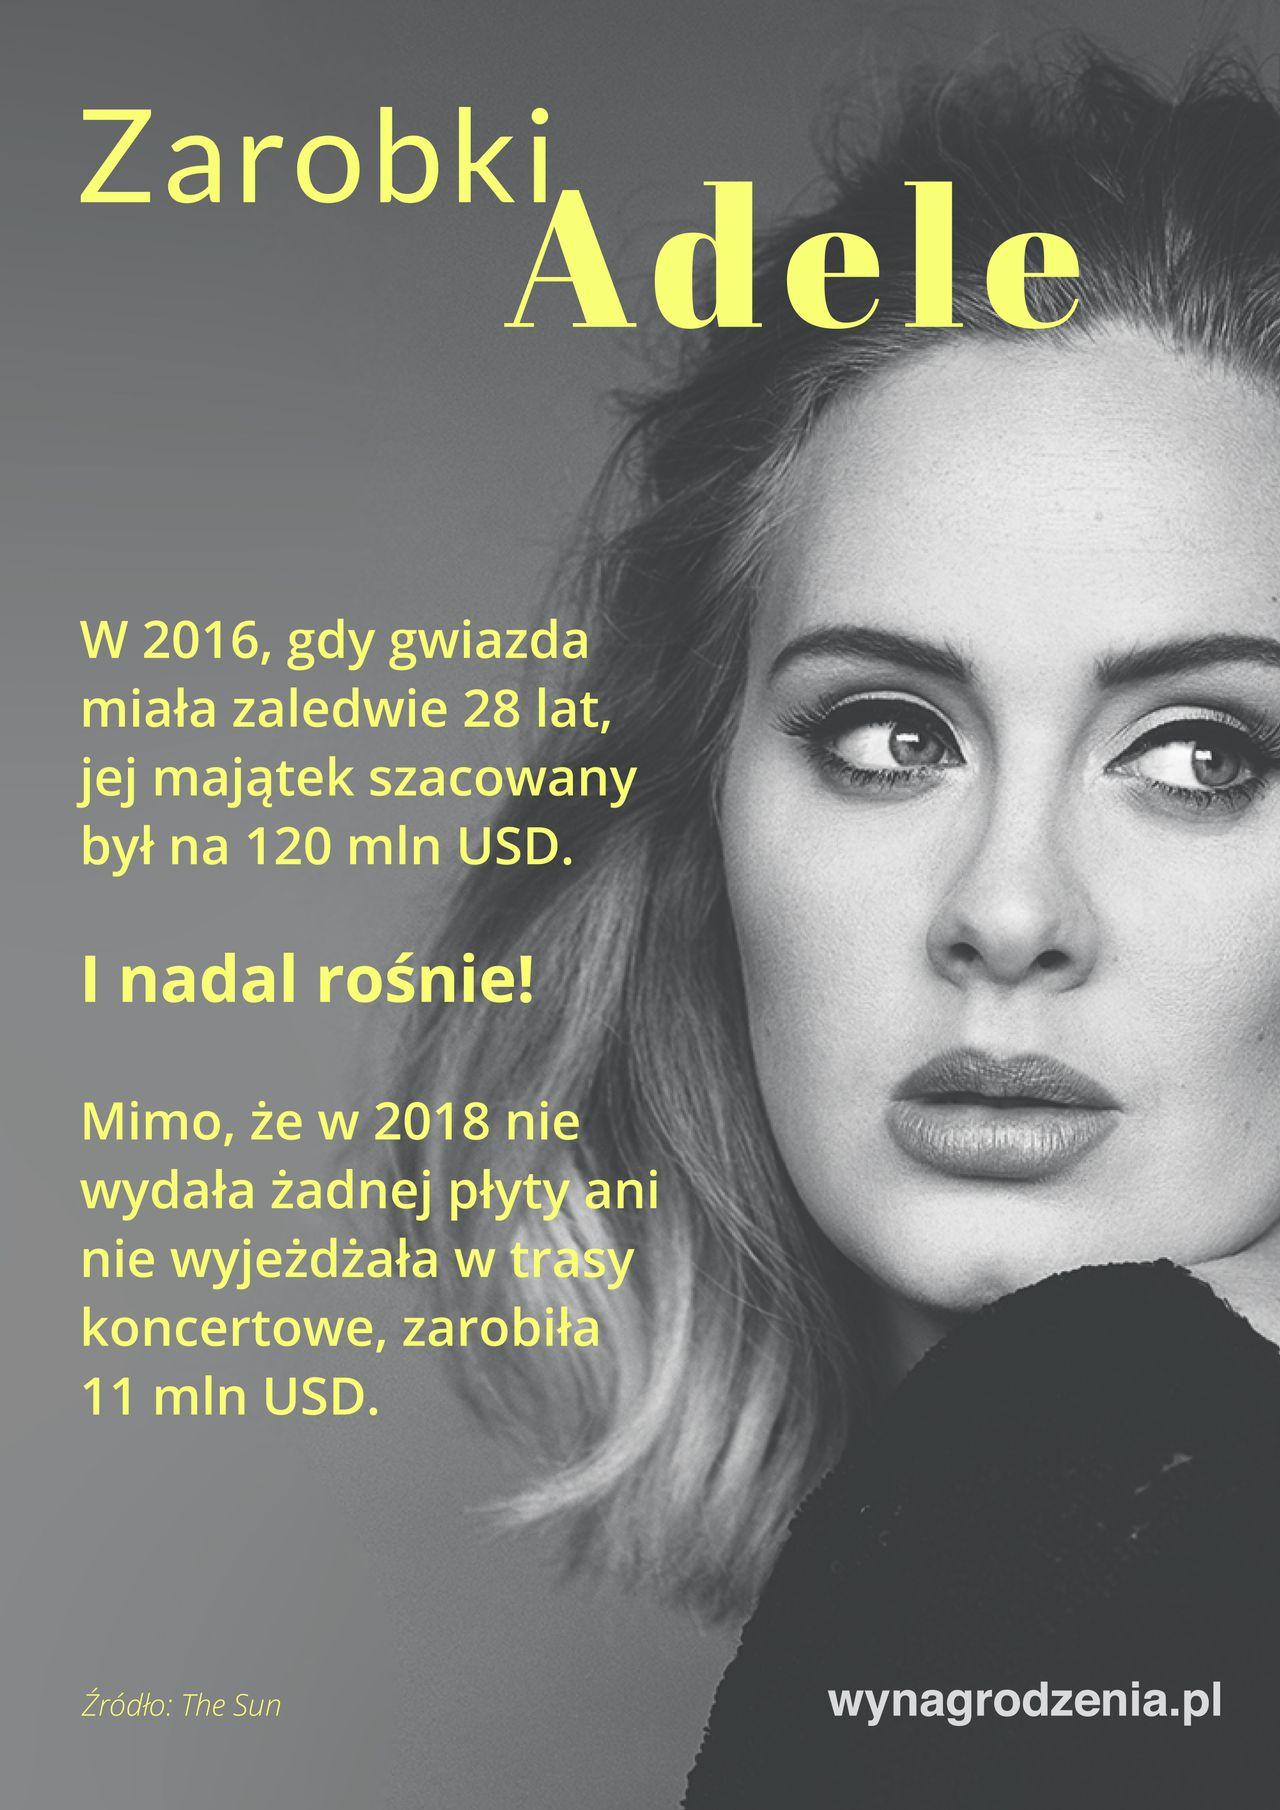 Ile zarabia Adele?